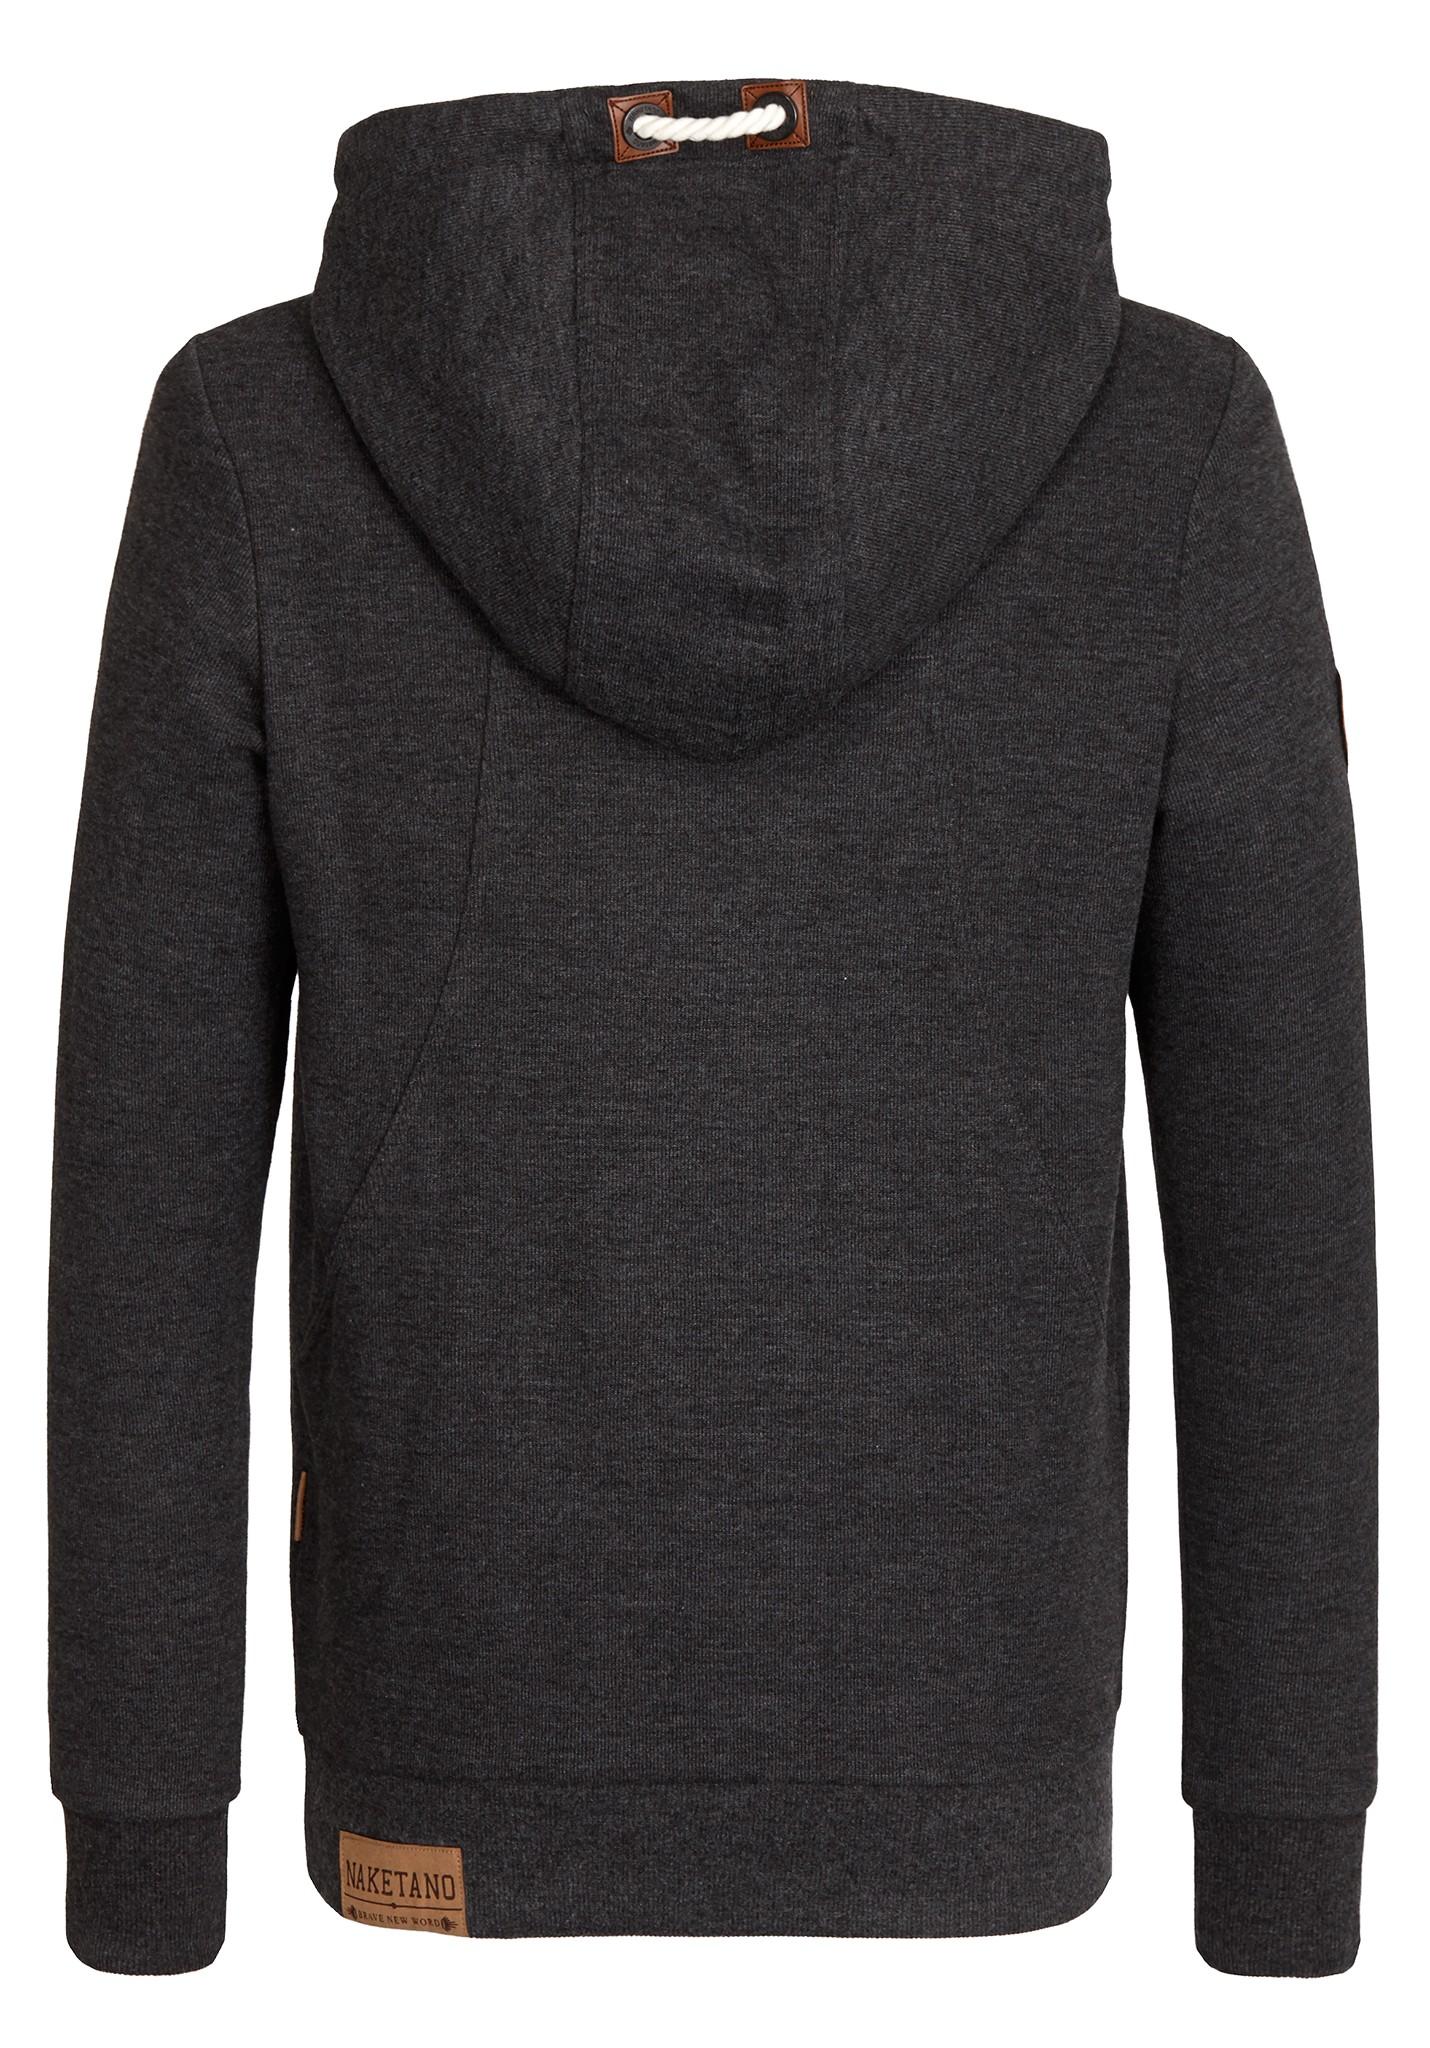 neu naketano the ether herren kapuzenpullover pullover hoodie kapuzenjacke ebay. Black Bedroom Furniture Sets. Home Design Ideas